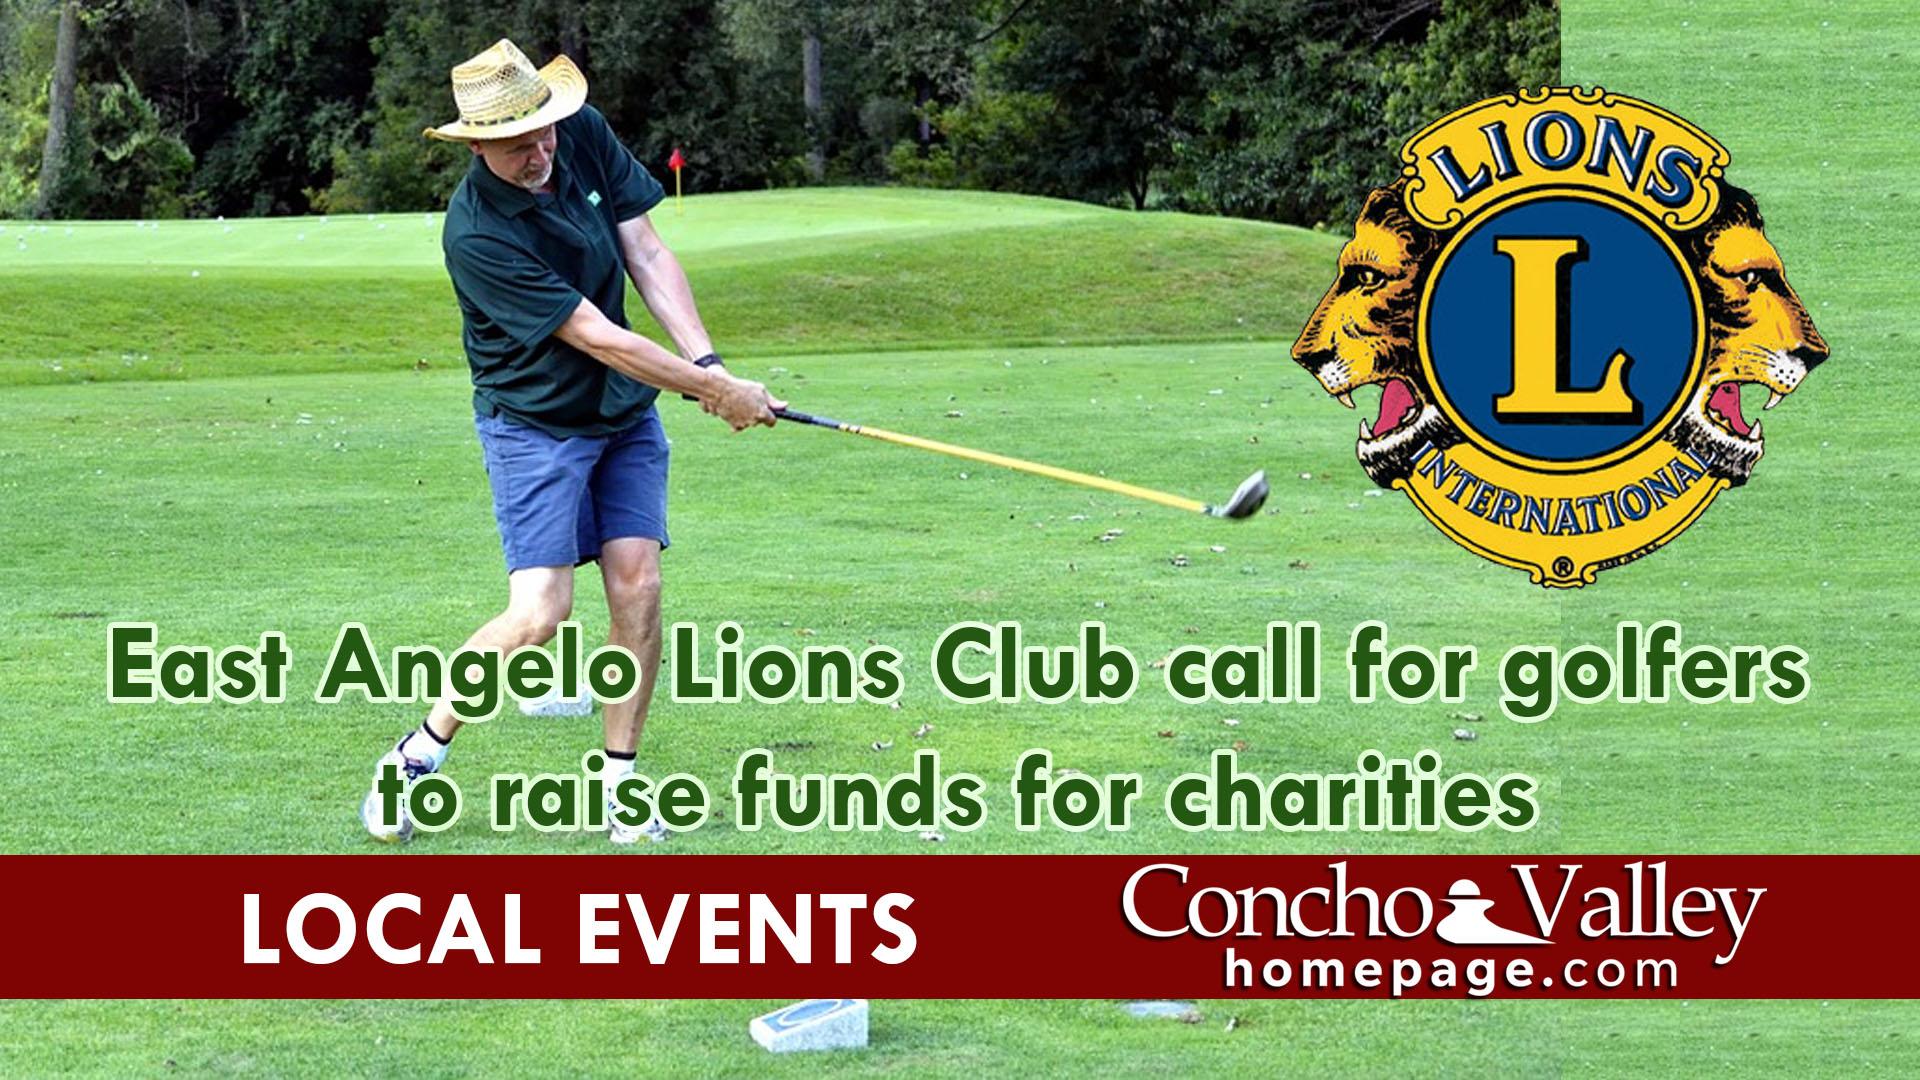 Lions Club Bunker Bash Golf Tournament Needs More Golfers